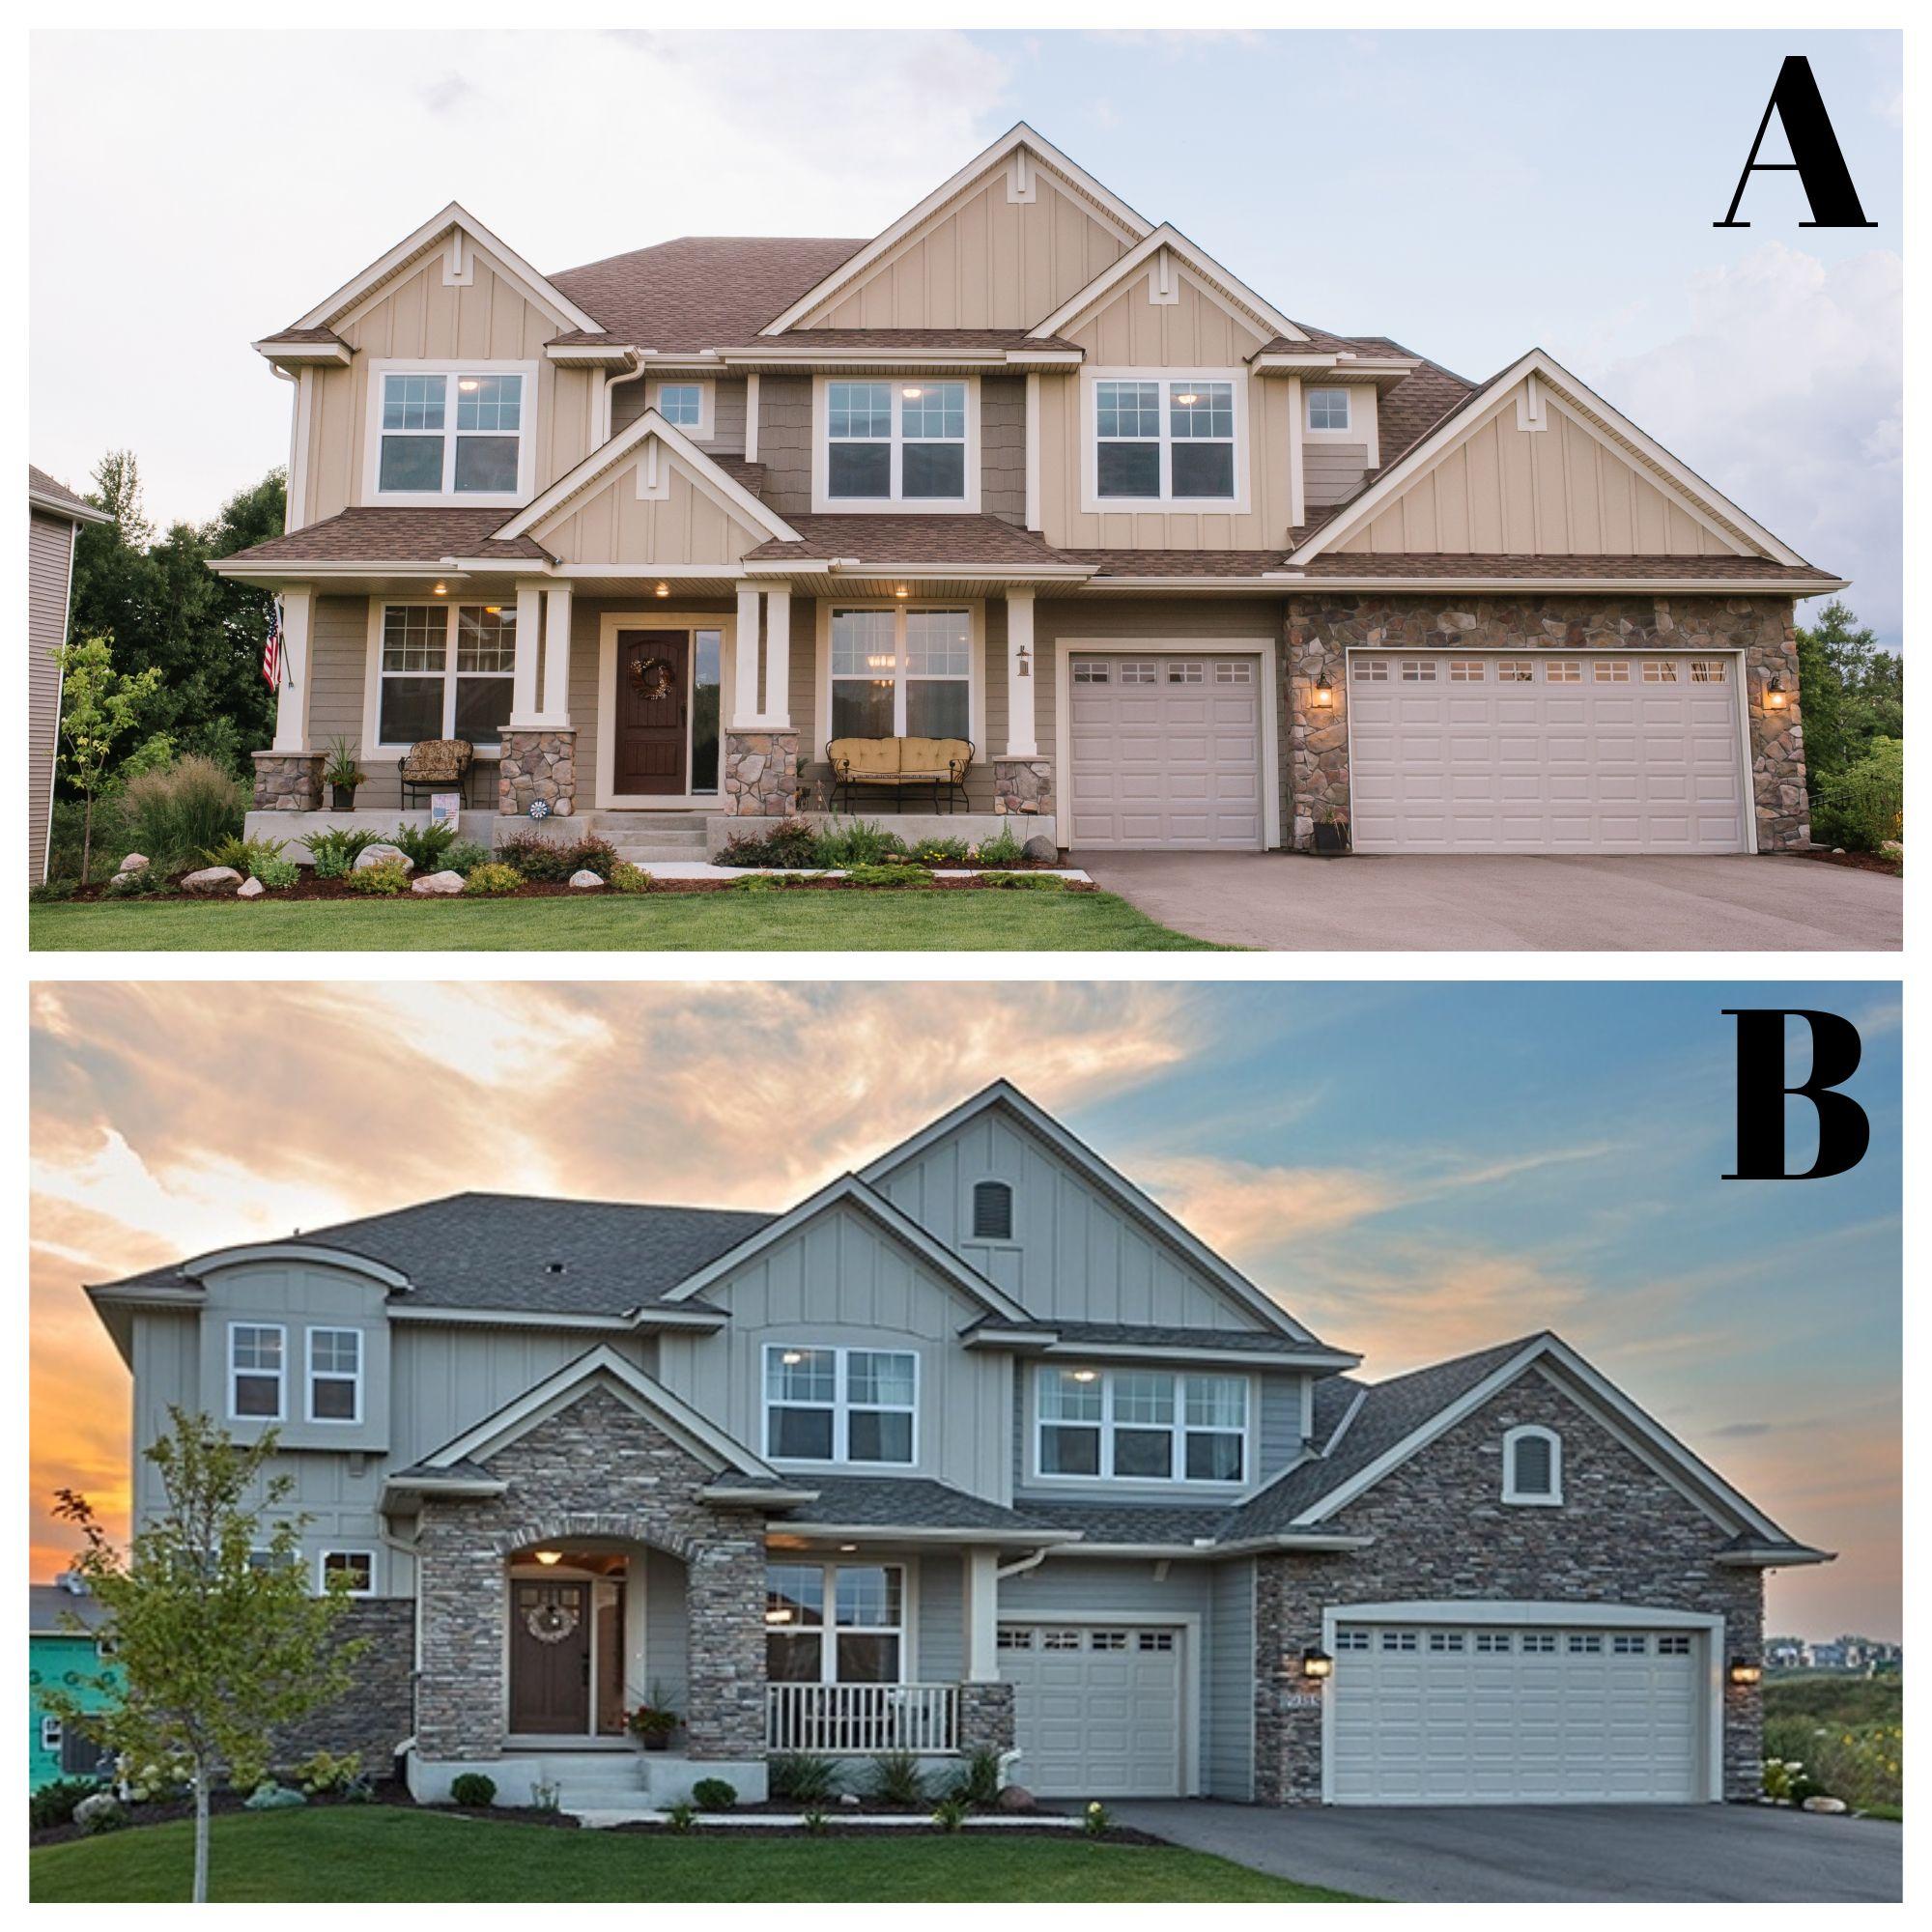 Pick One Minnesota Home Eagle Homes New Home Construction